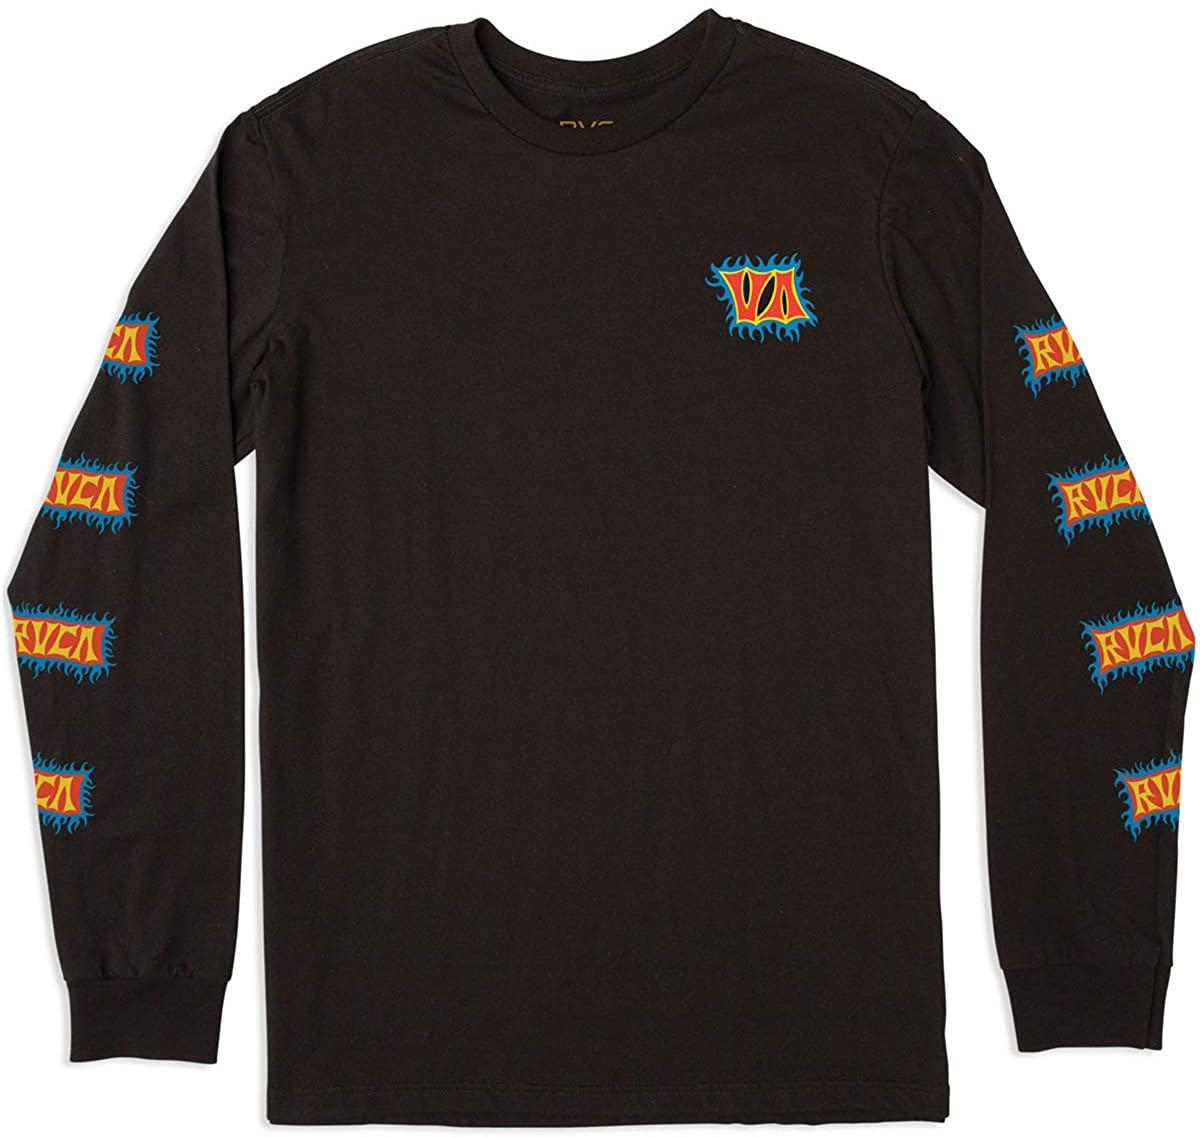 RVCA Boys' Big Crawling Long Sleeve Crew Neck T-Shirt